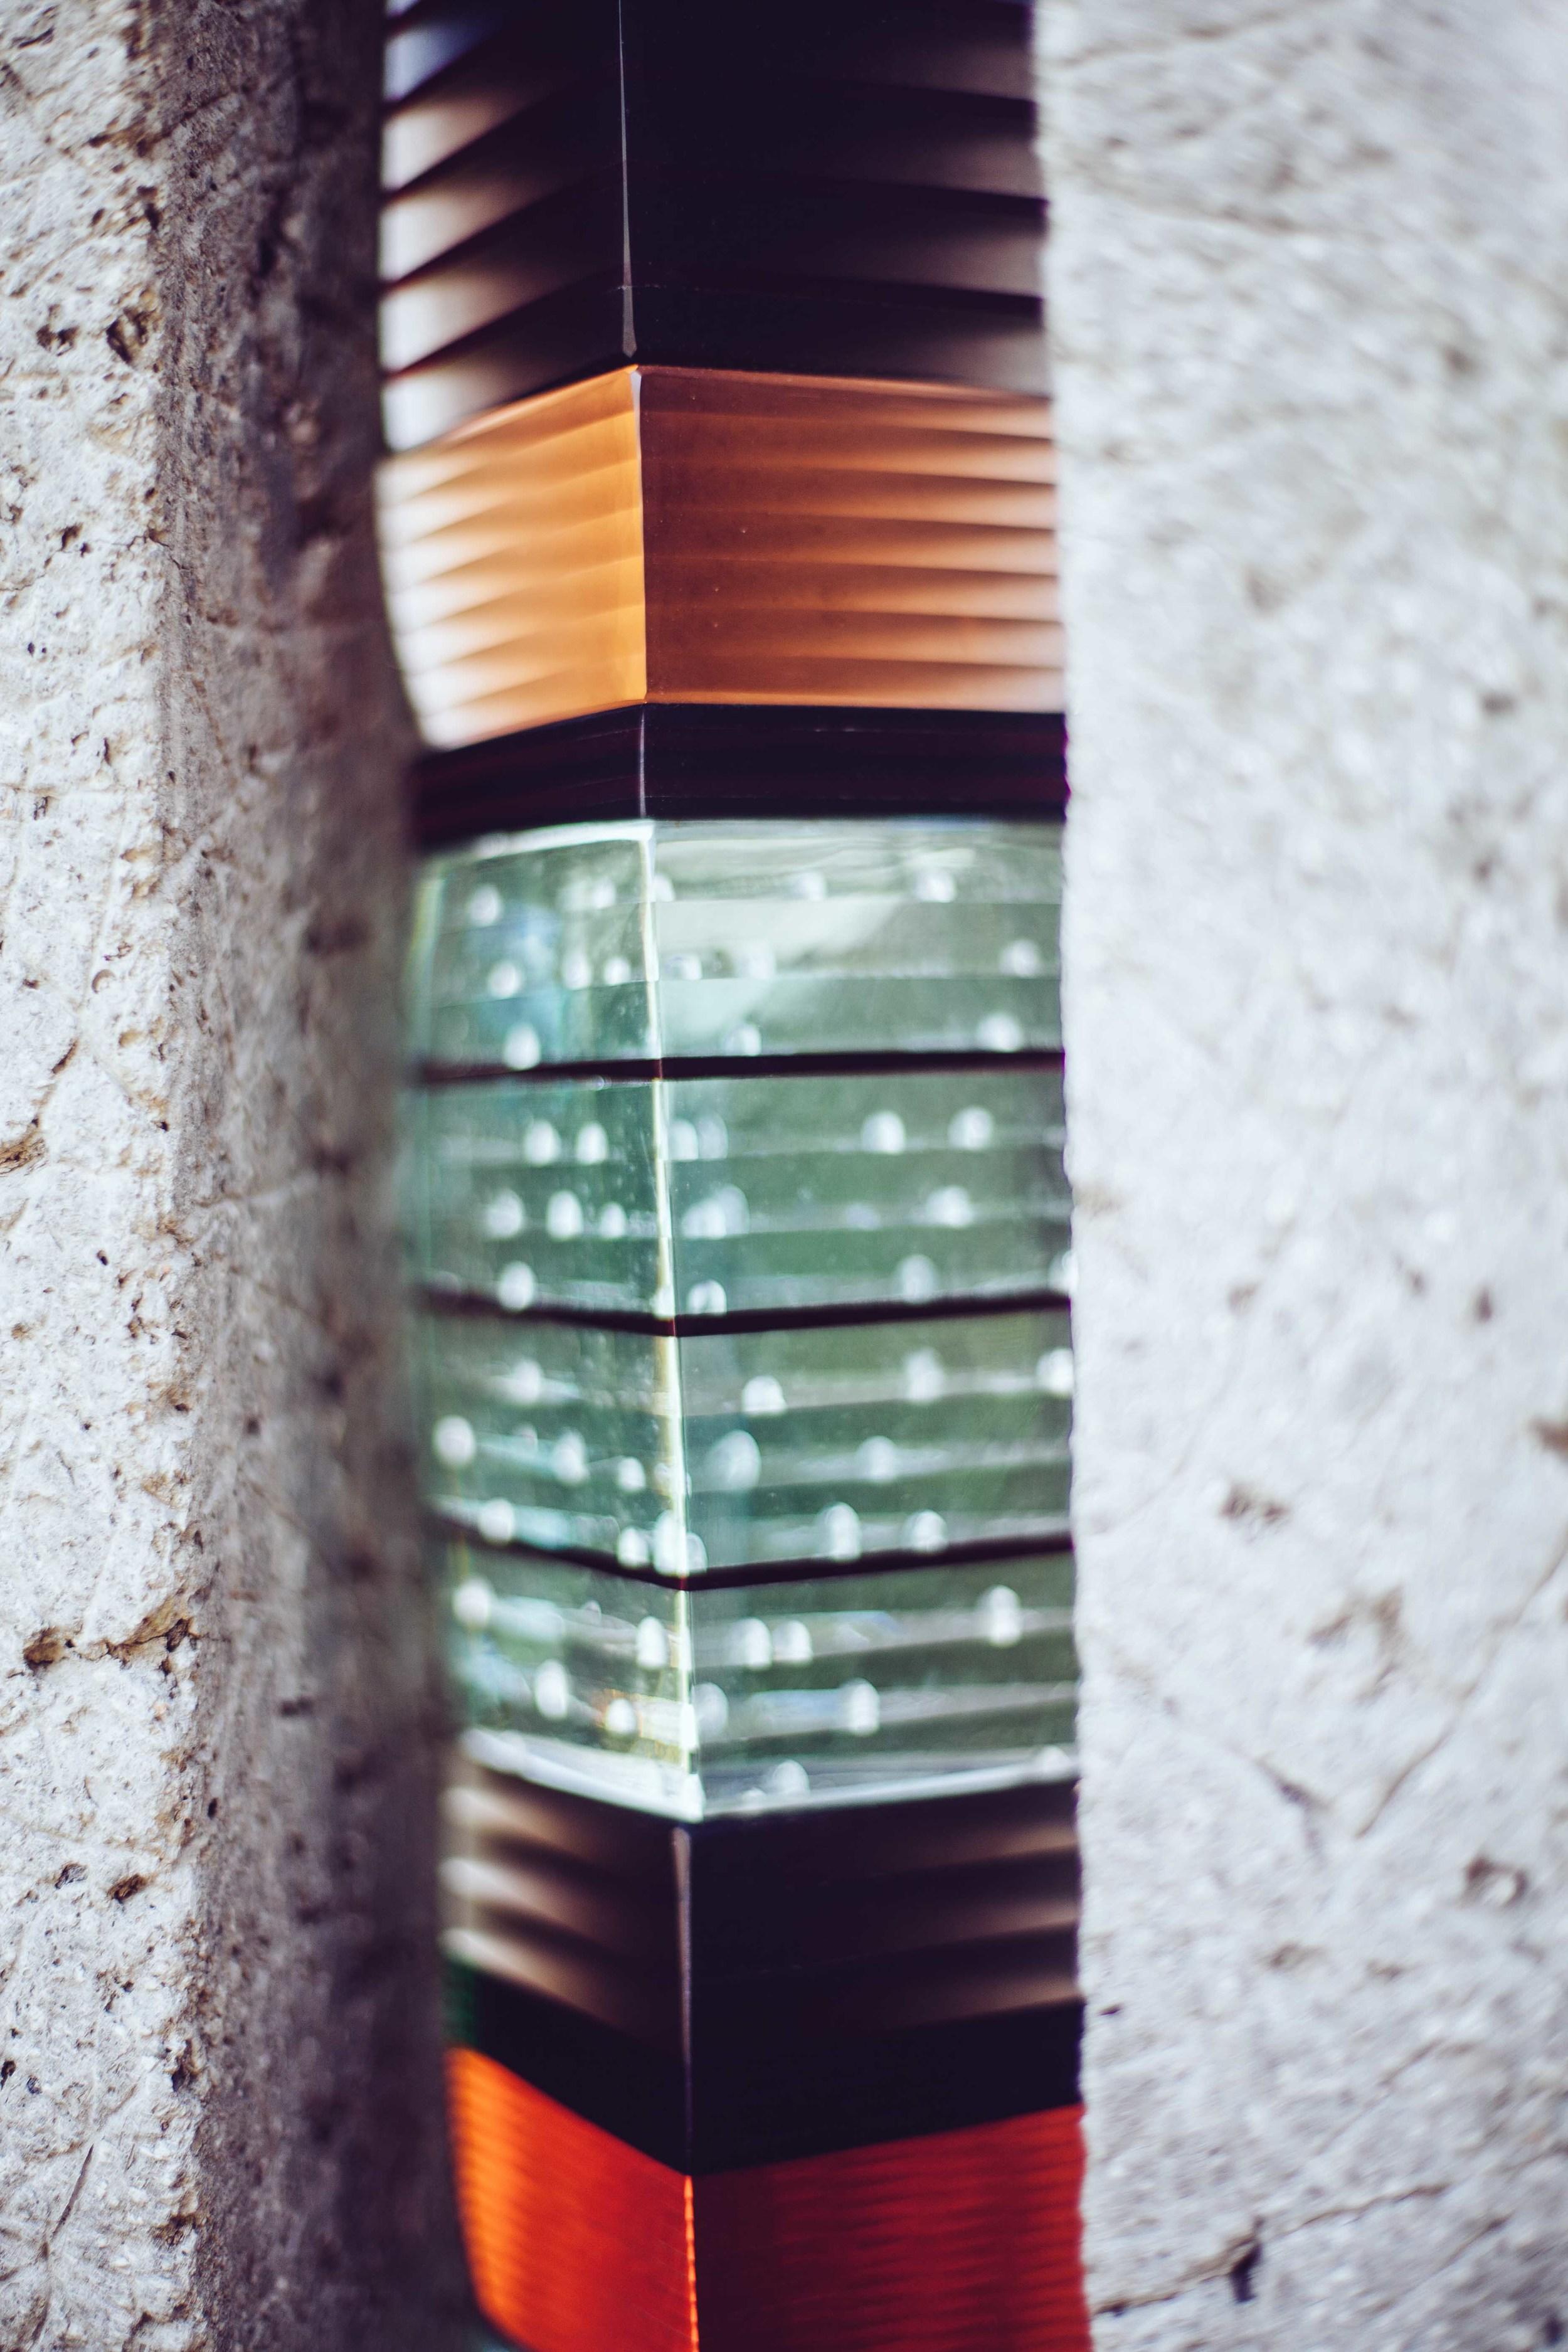 Some cool glass art.